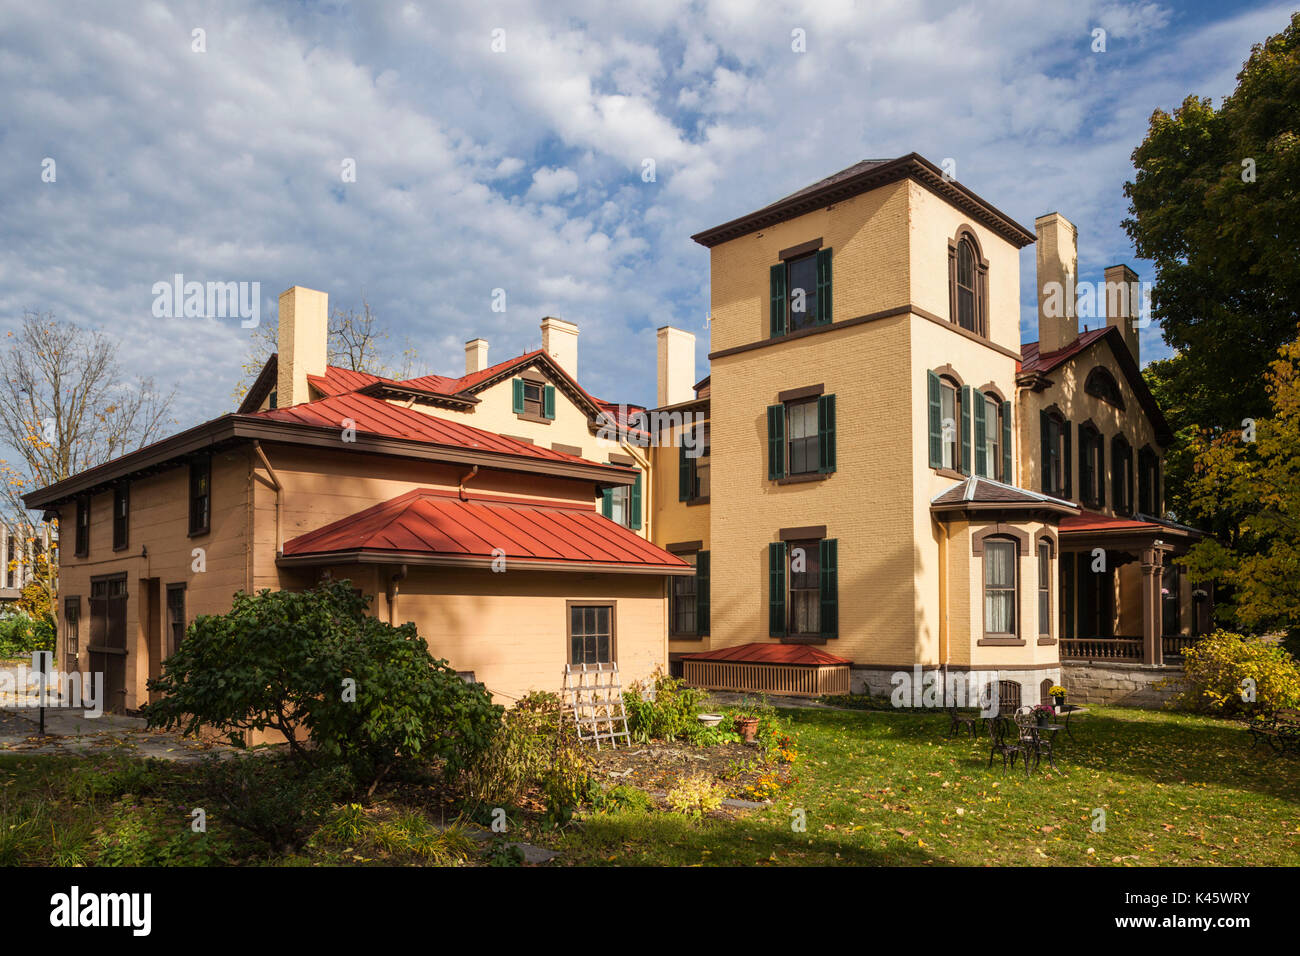 USA, New York, Finger Lakes Region, Auburn, Seward House Museum, former home Secretary of State William Seward who was responsible for acquiring Alaska - Stock Image